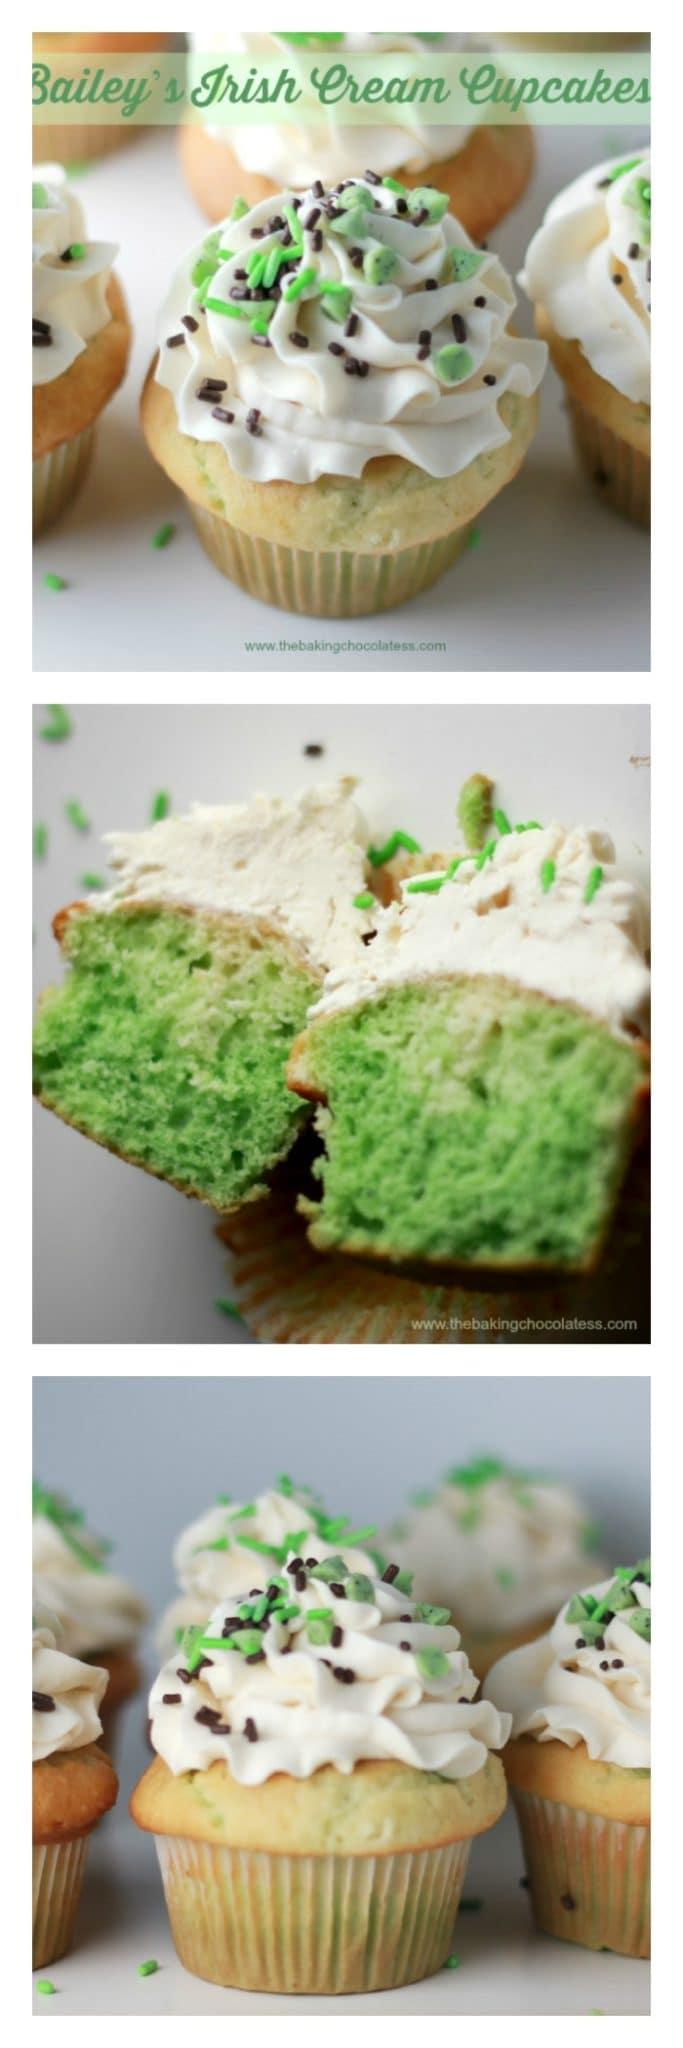 Bailey's Irish Cream Cupcakes! - Get lucky with these Bailey's Irish Cream infused cupcakes iced with a creamy delicious Bailey's Irish Cream Buttercream Frosting. YUM!! #baileys #irishcream #cupcakes #frosting #stpatricks #stuffed